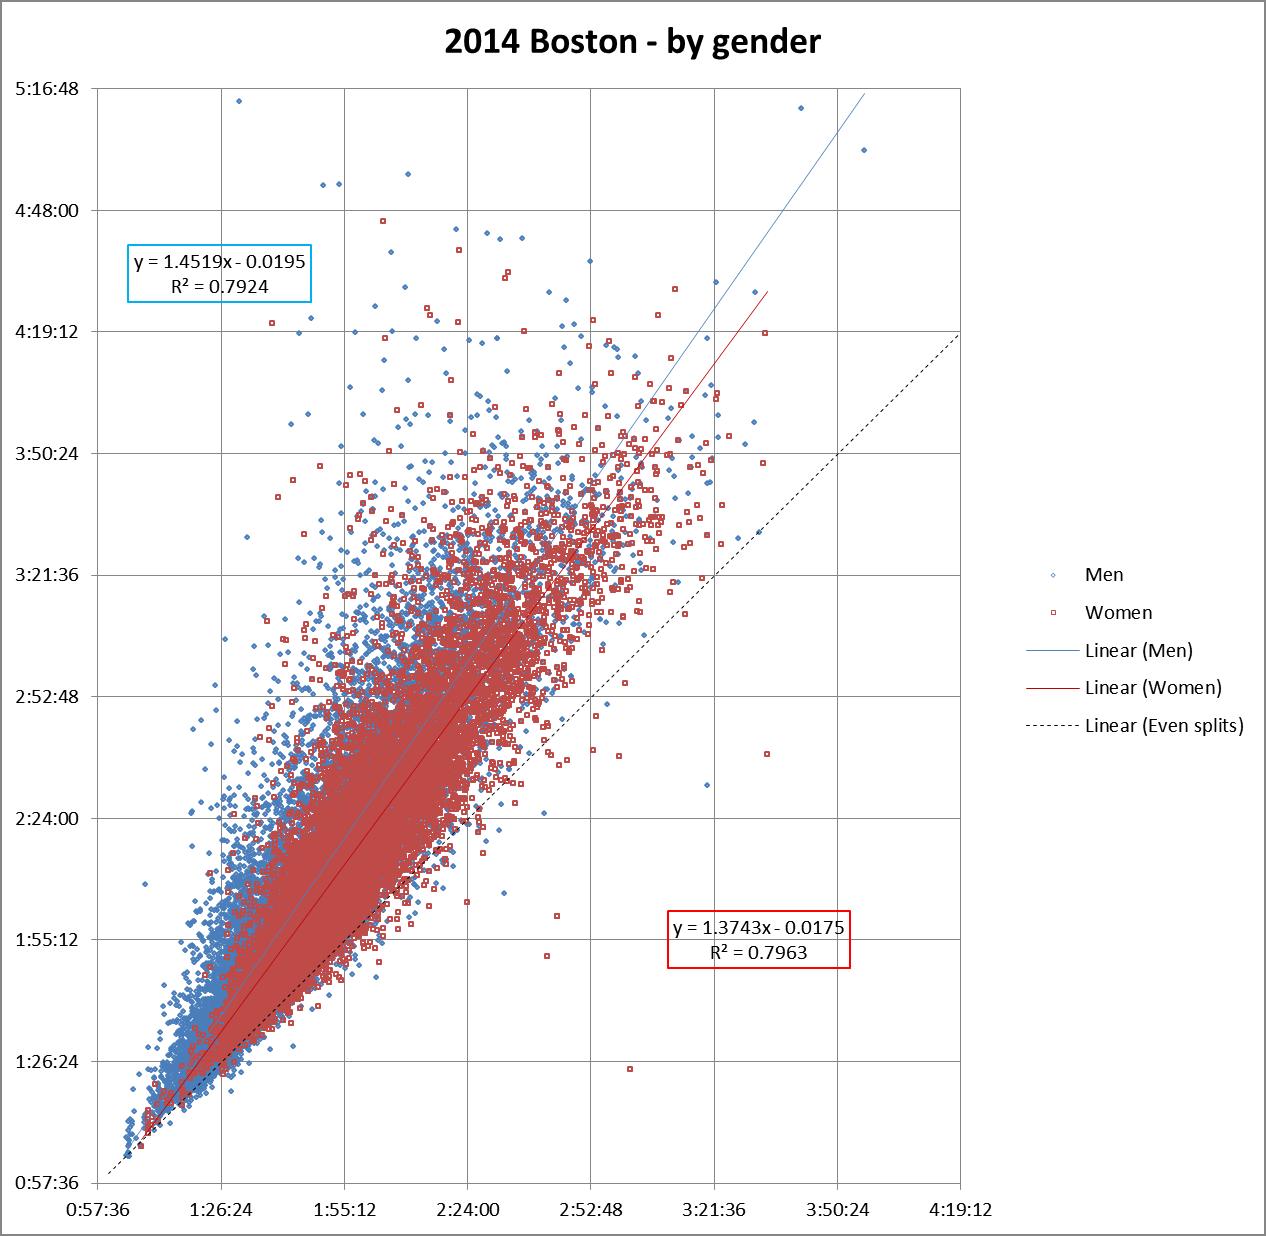 Boston 2014 gender